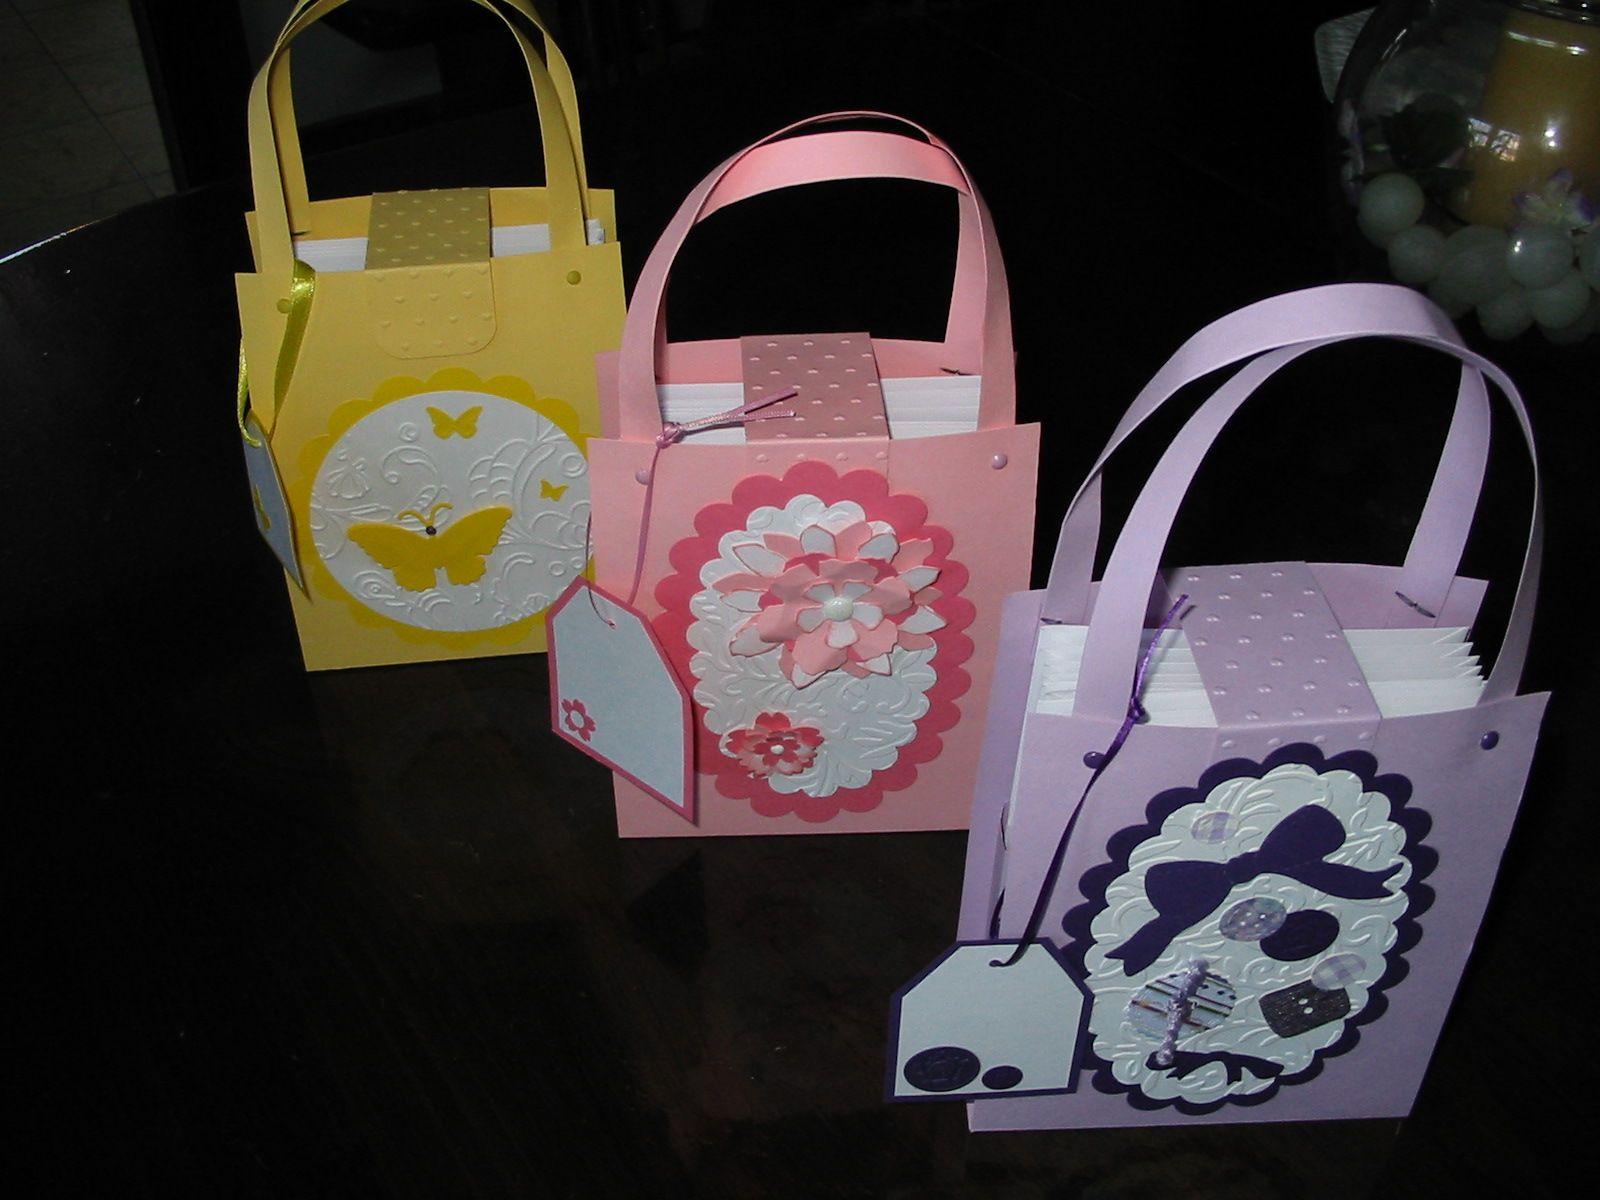 card holder gift bags  gift bags gifts card holder